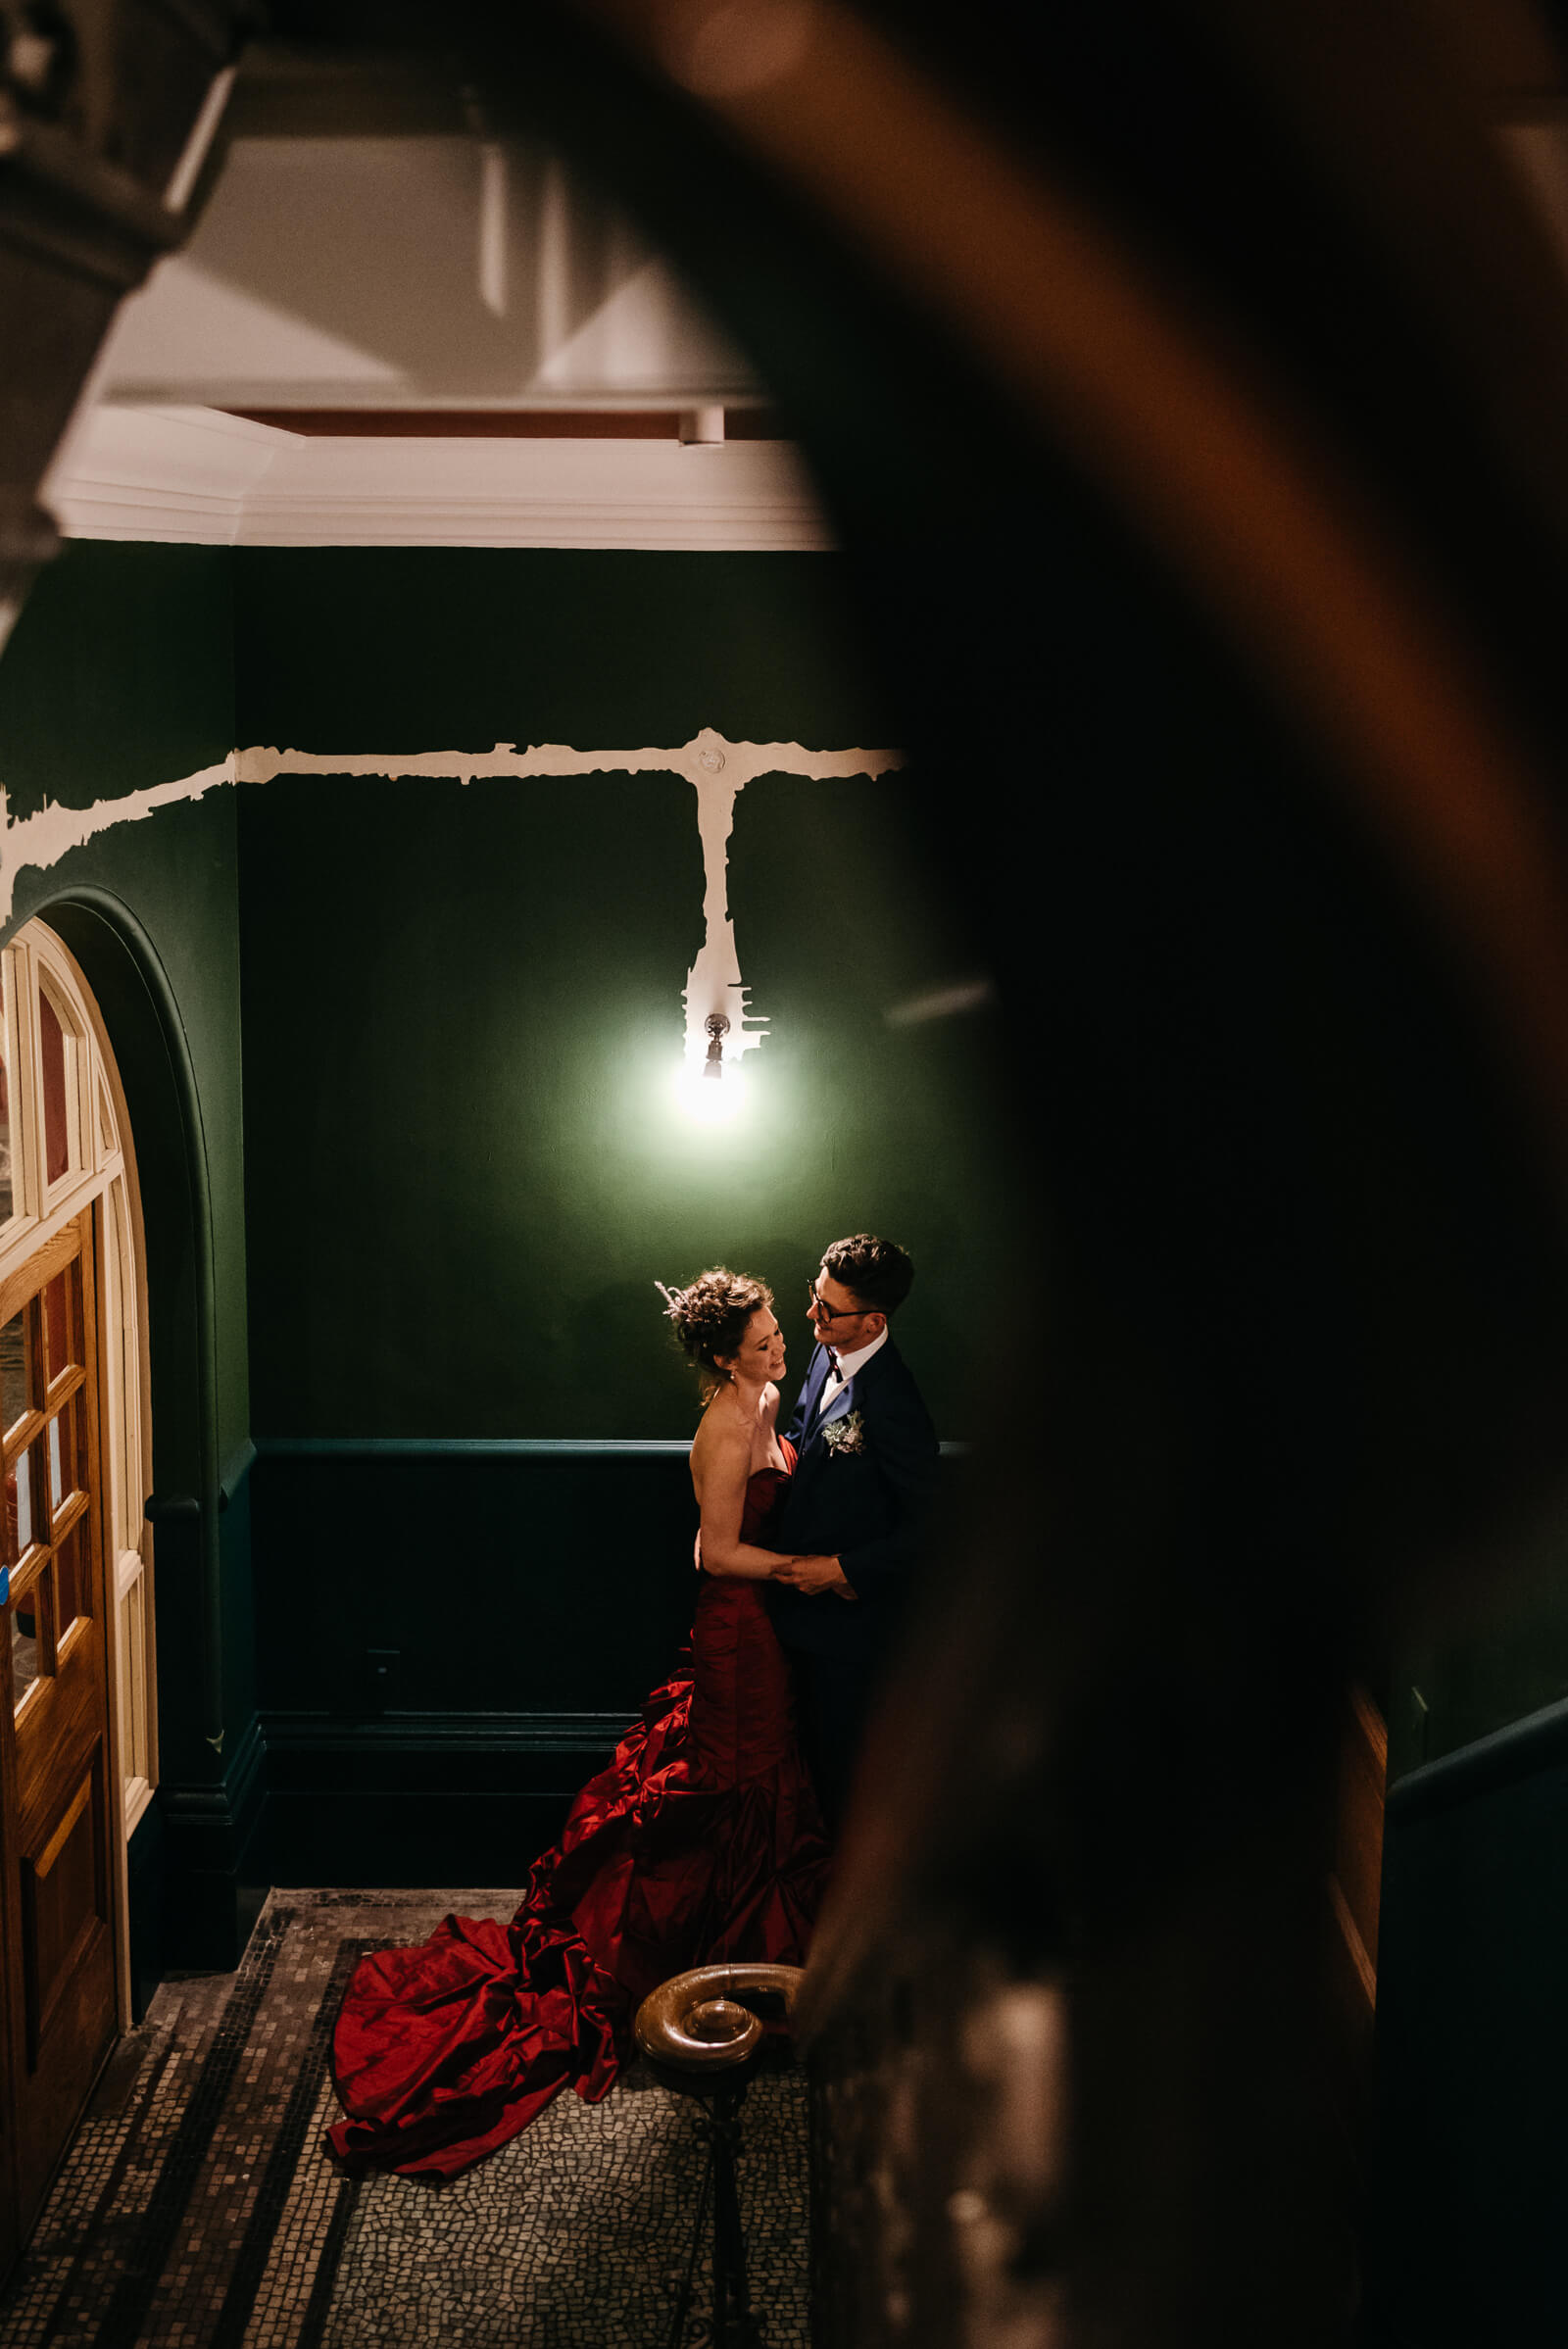 creative wedding portrait of bride and groom at Battersea Arts Centre